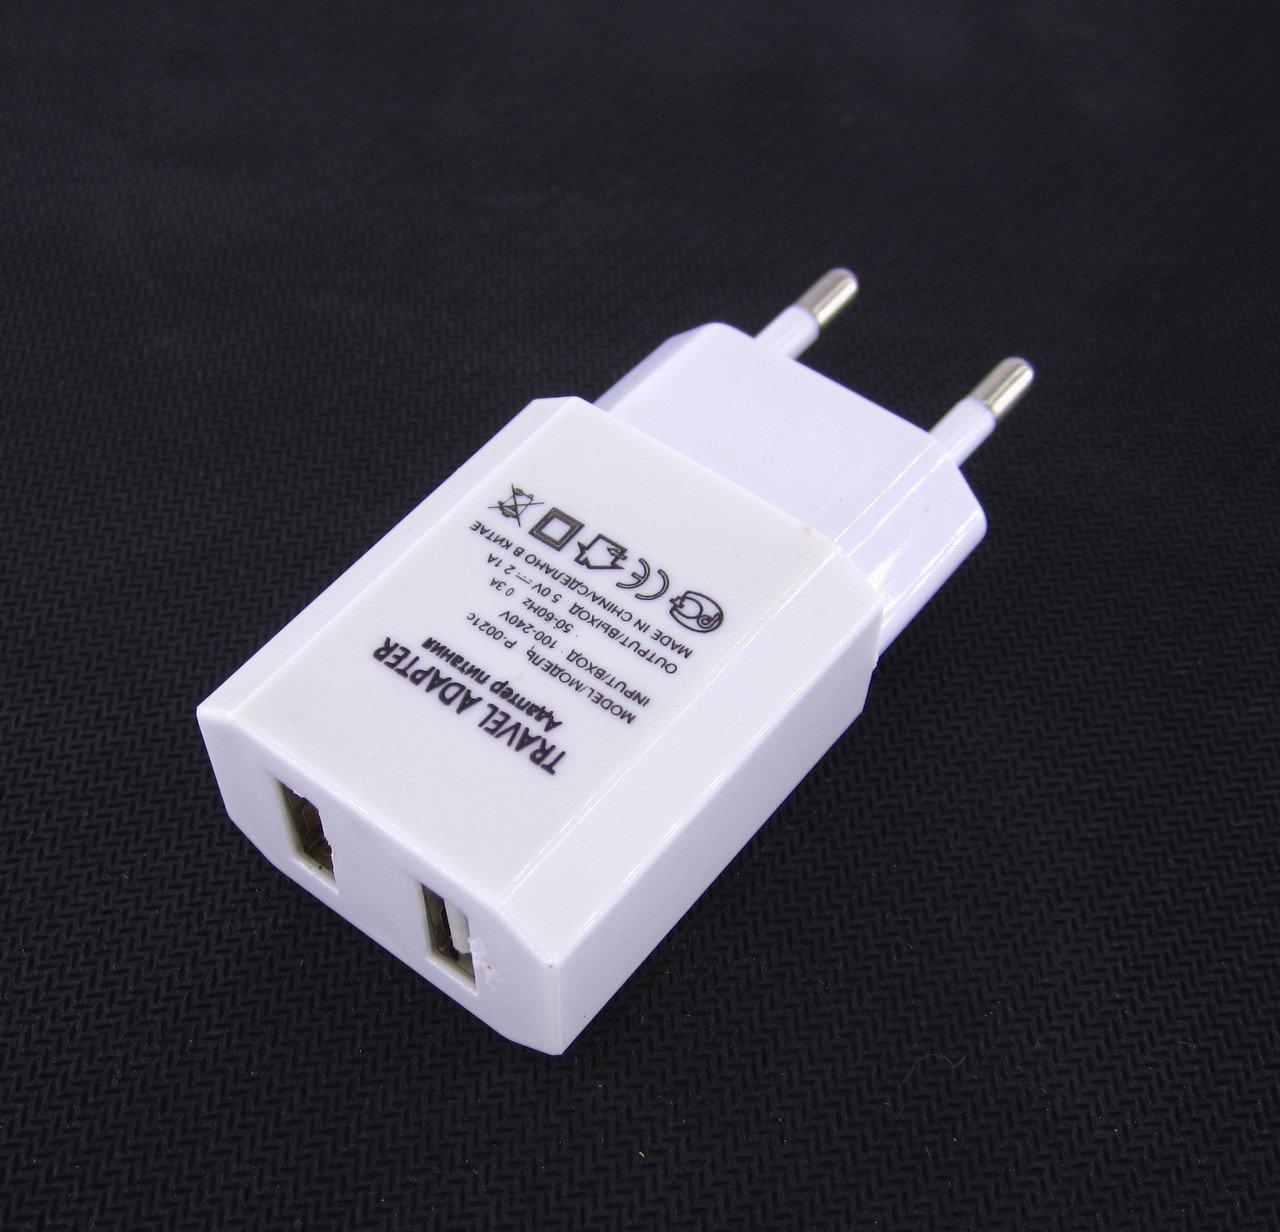 Сетевое зарядное устройство 2 usb 5v 2.0a (p-0021c)